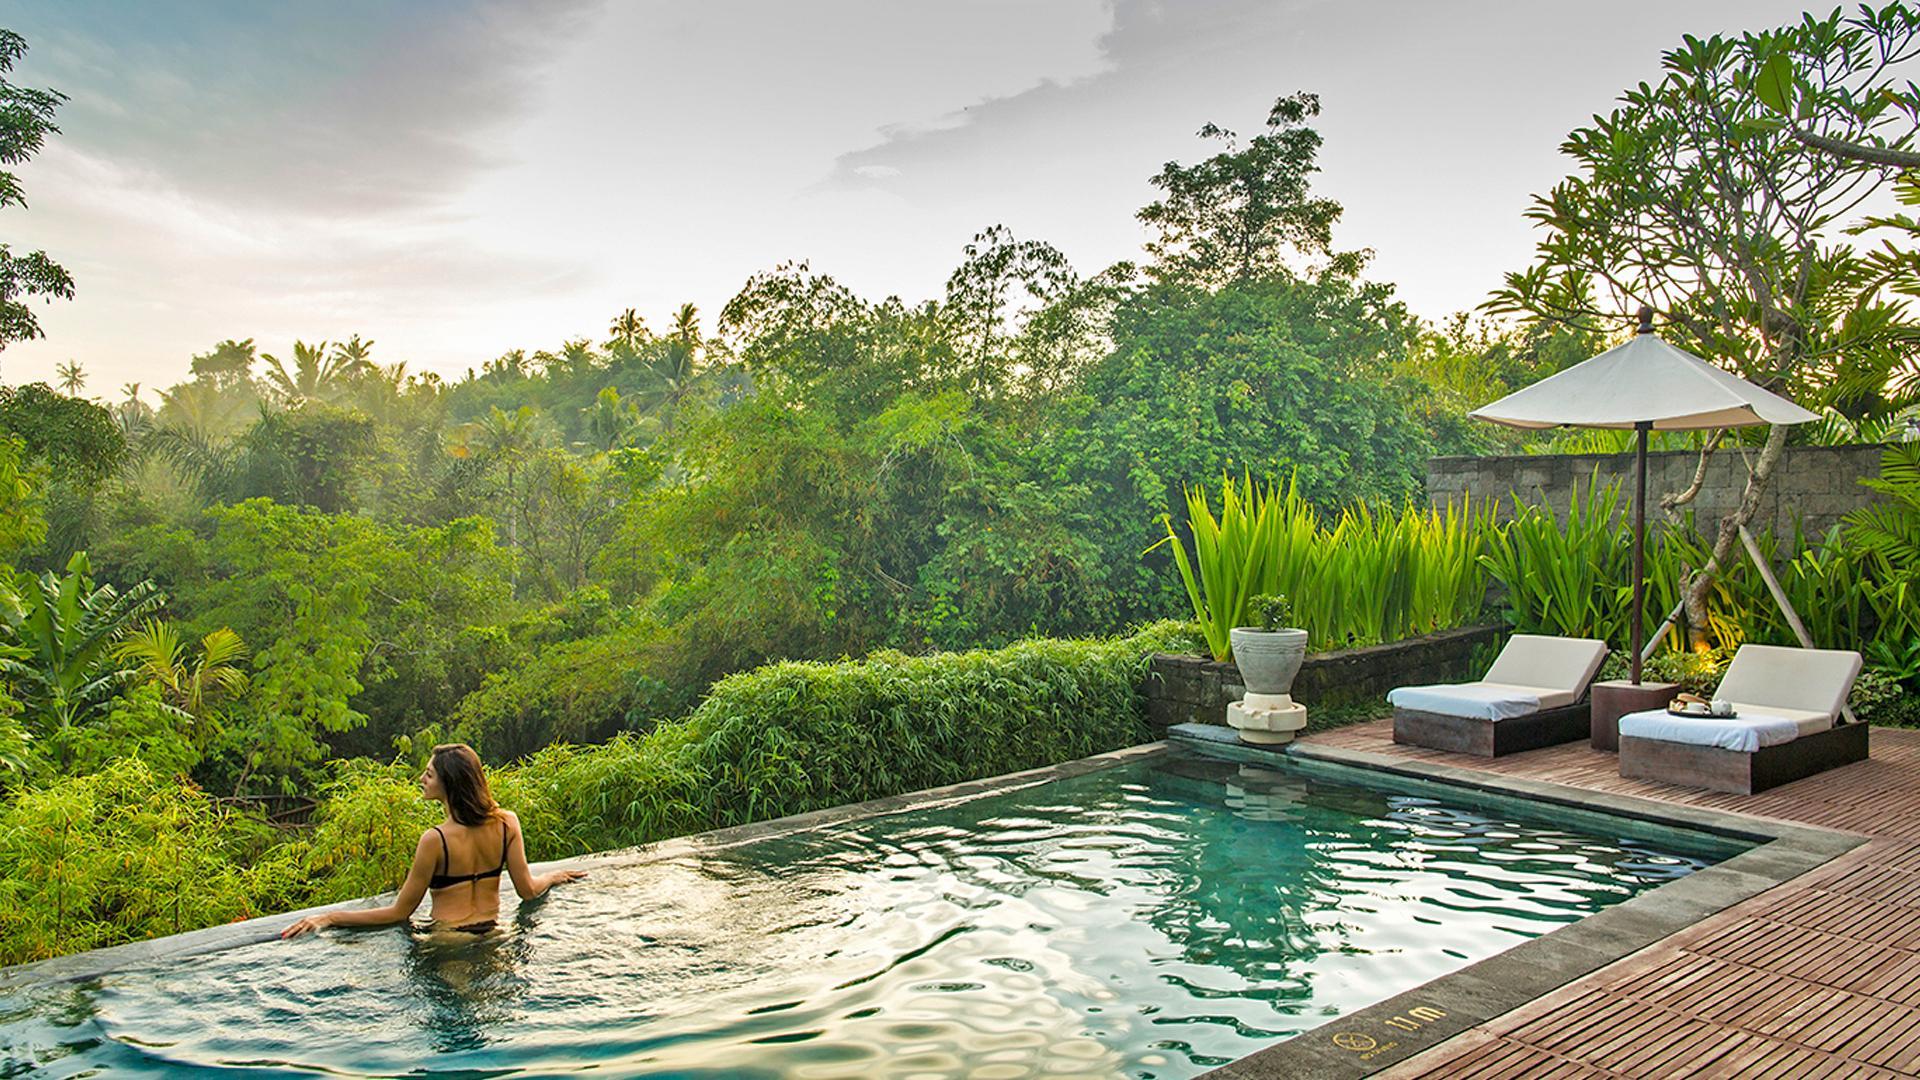 One Bedroom Riverside Pool Villa image 1 at Sanctoo Suites & Villas by Kabupaten Gianyar, Bali, Indonesia